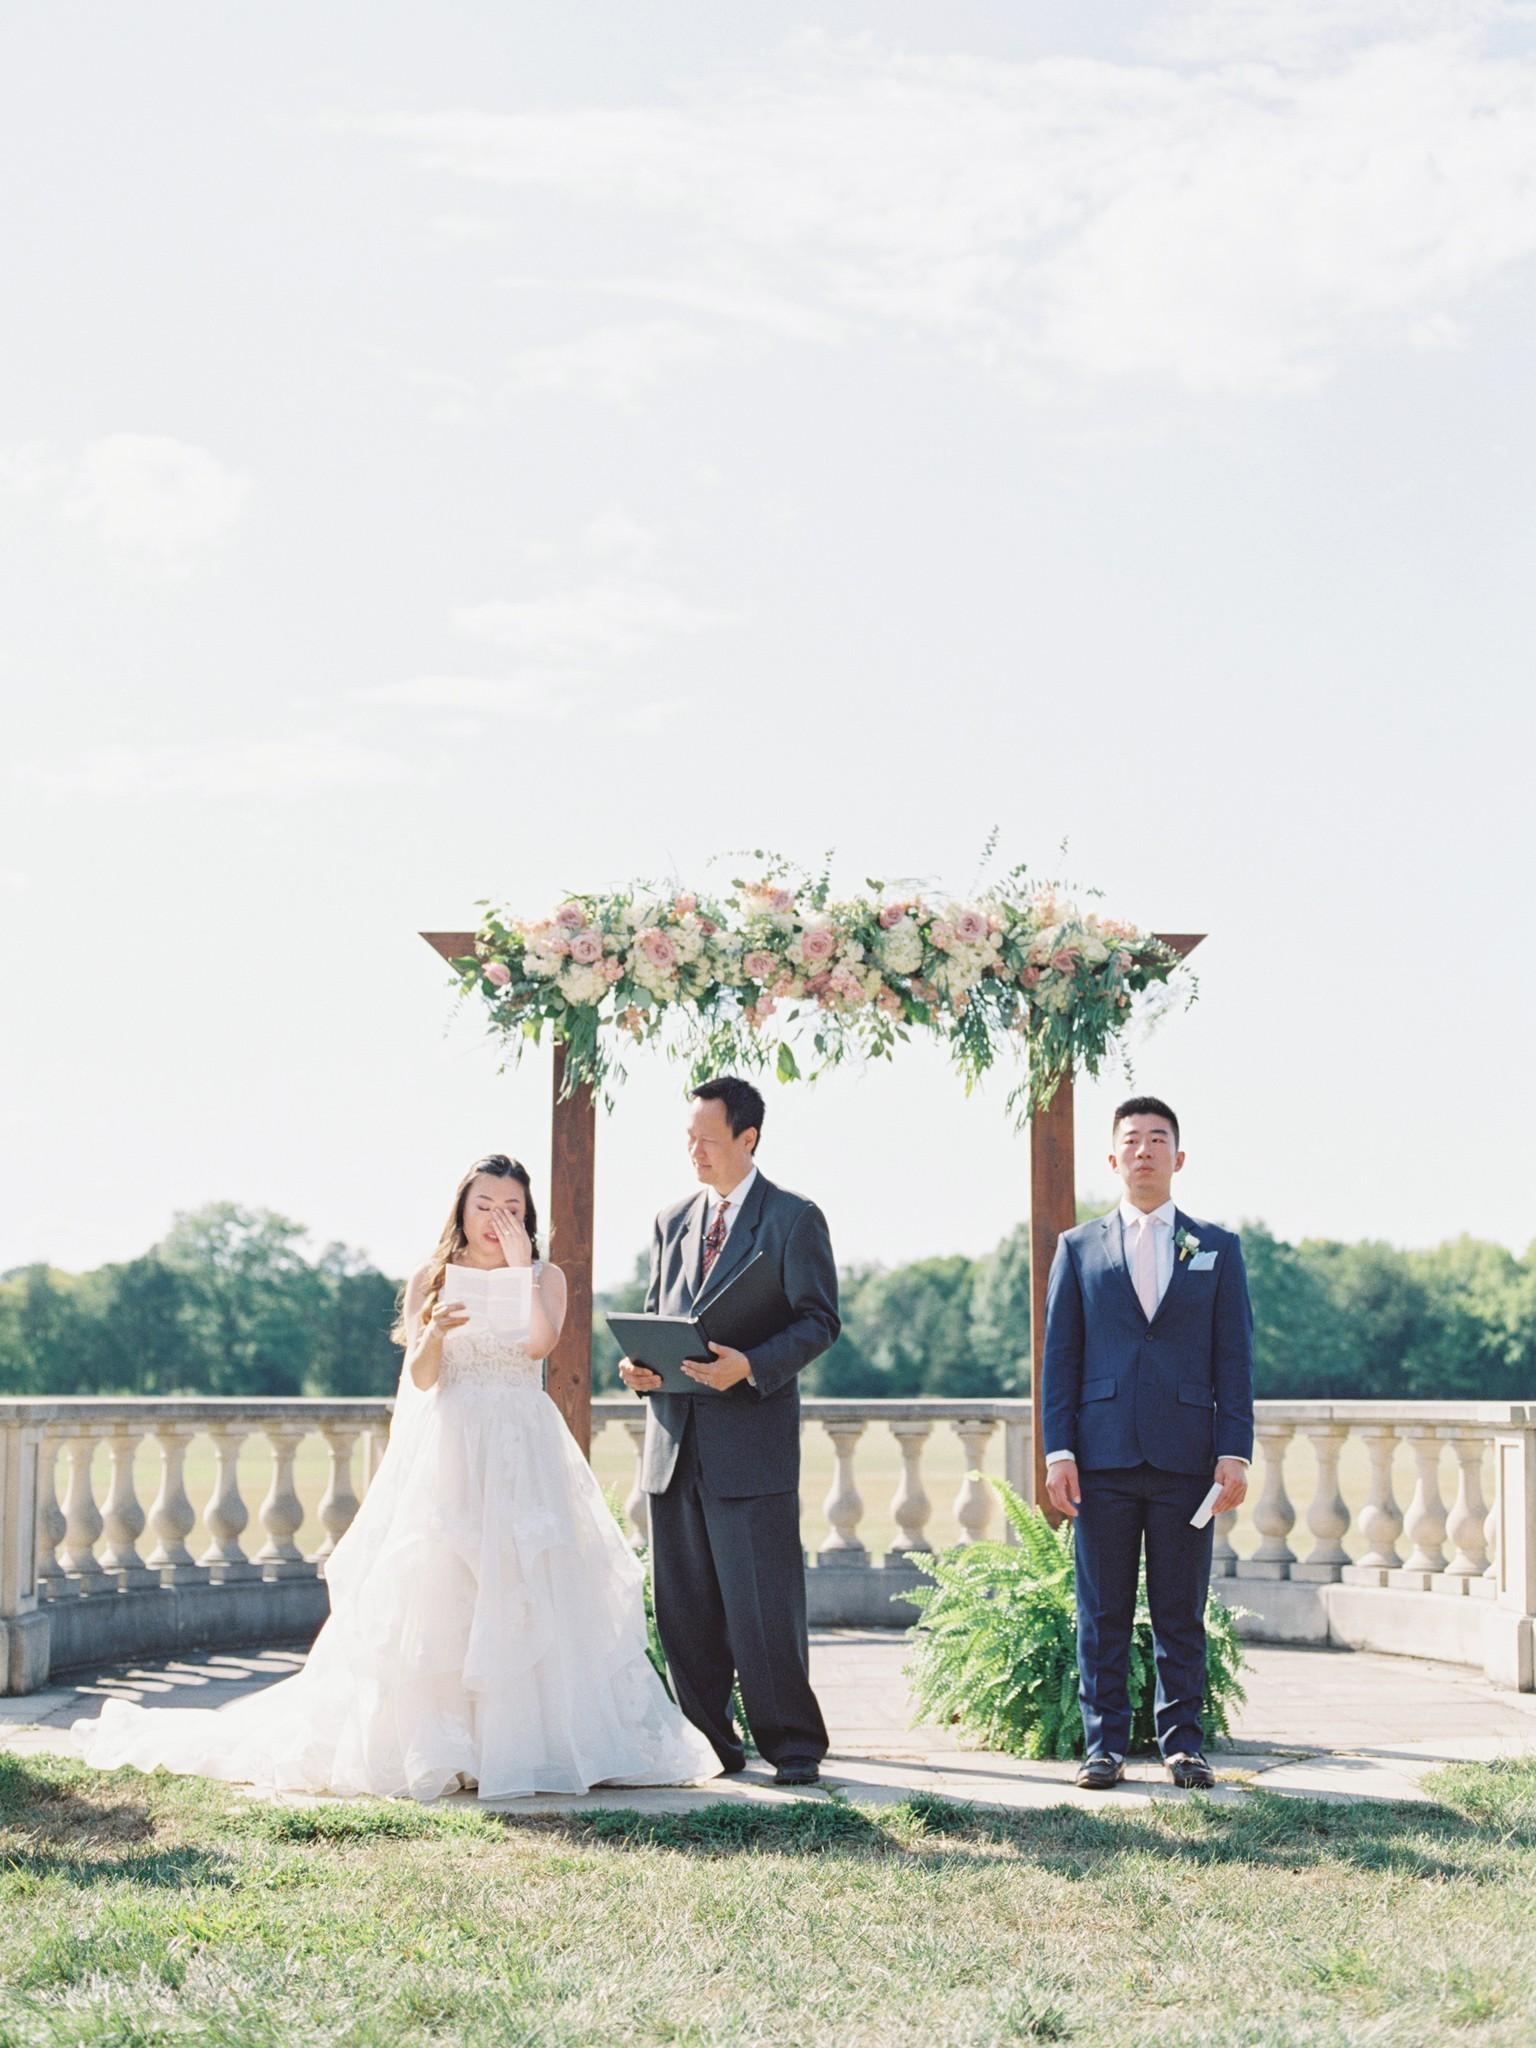 VA-Great-Marsh-Estate-Summer-Wedding-Blush-58.jpg